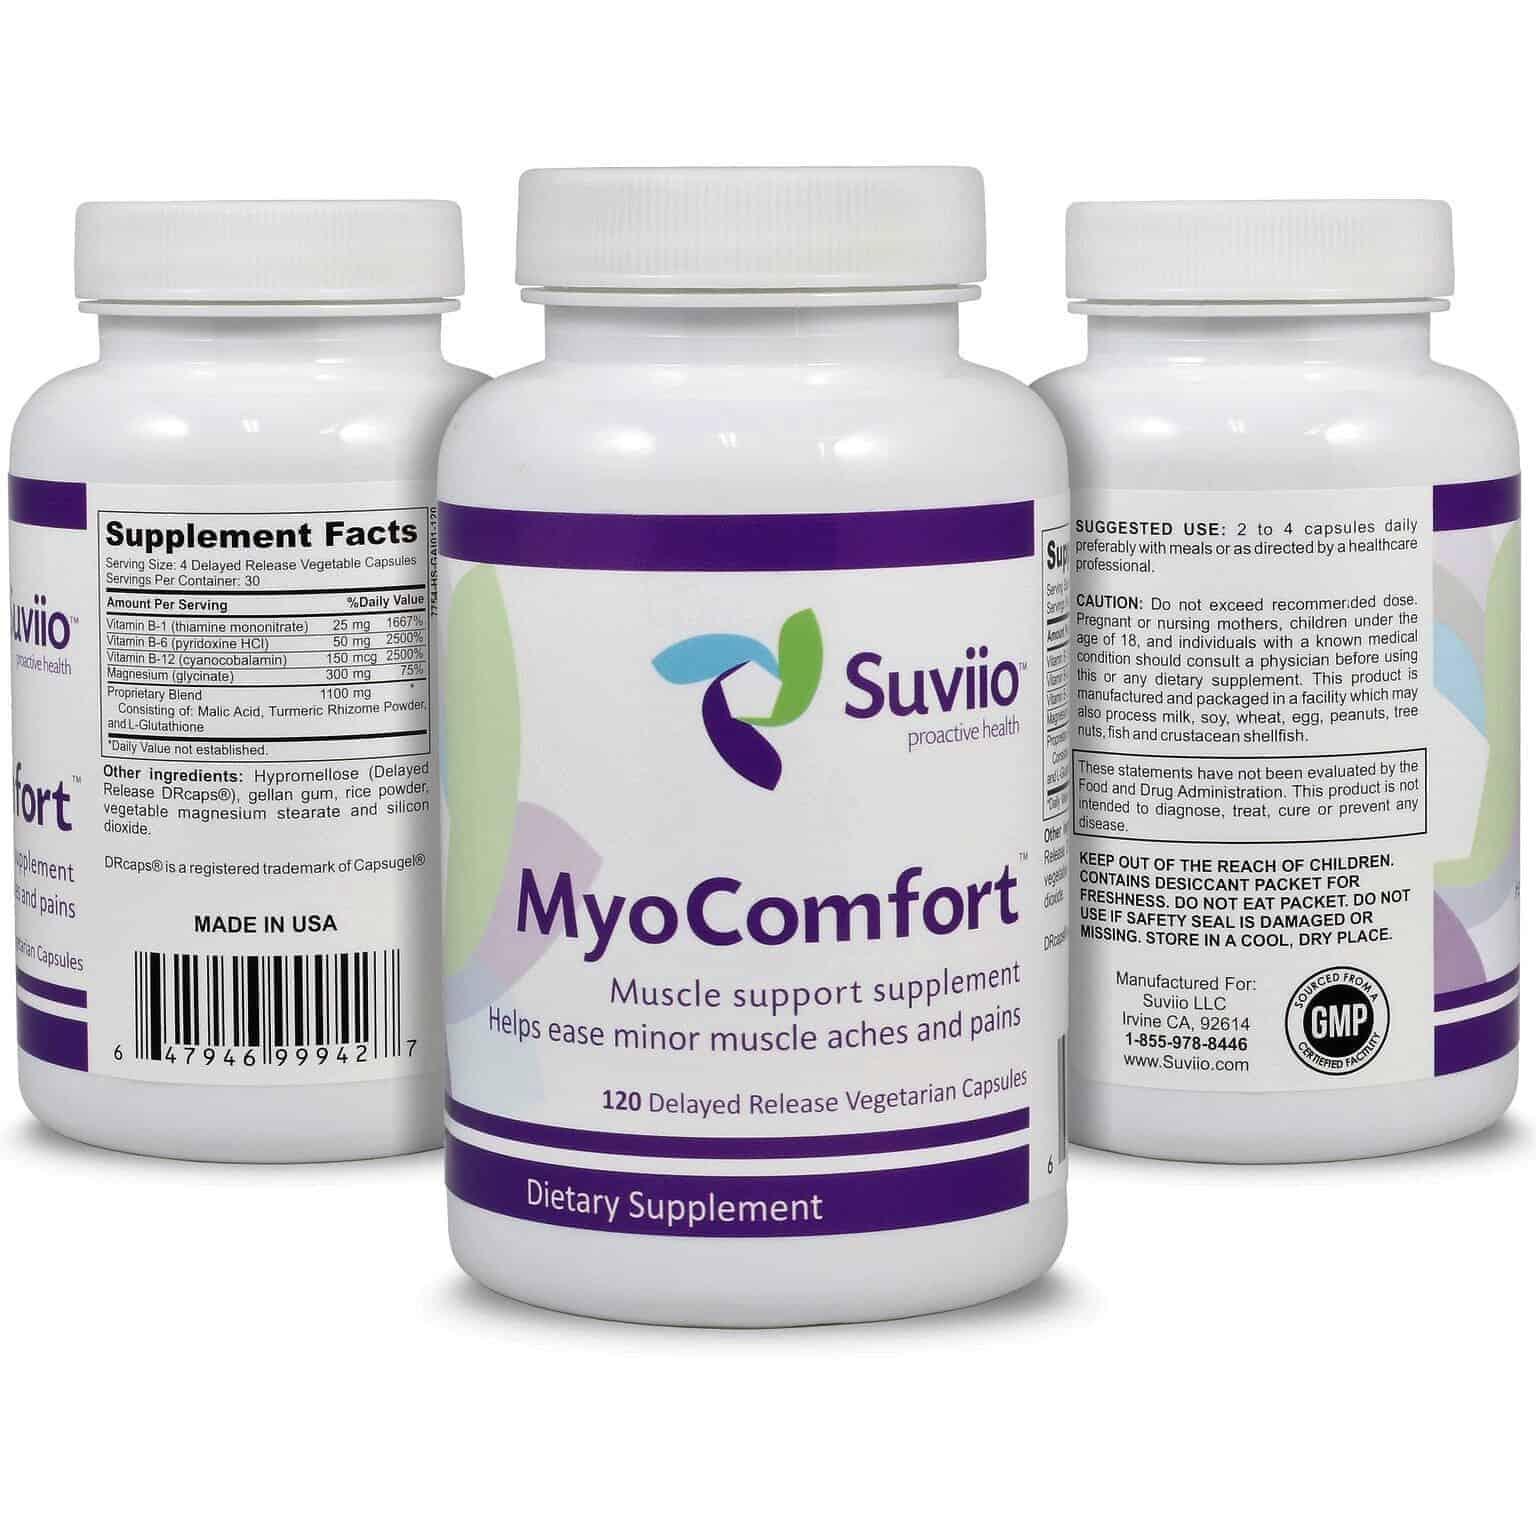 MyoComfort – 120 extended release capsules help mask taste and minimizes risk of reflux, 100%